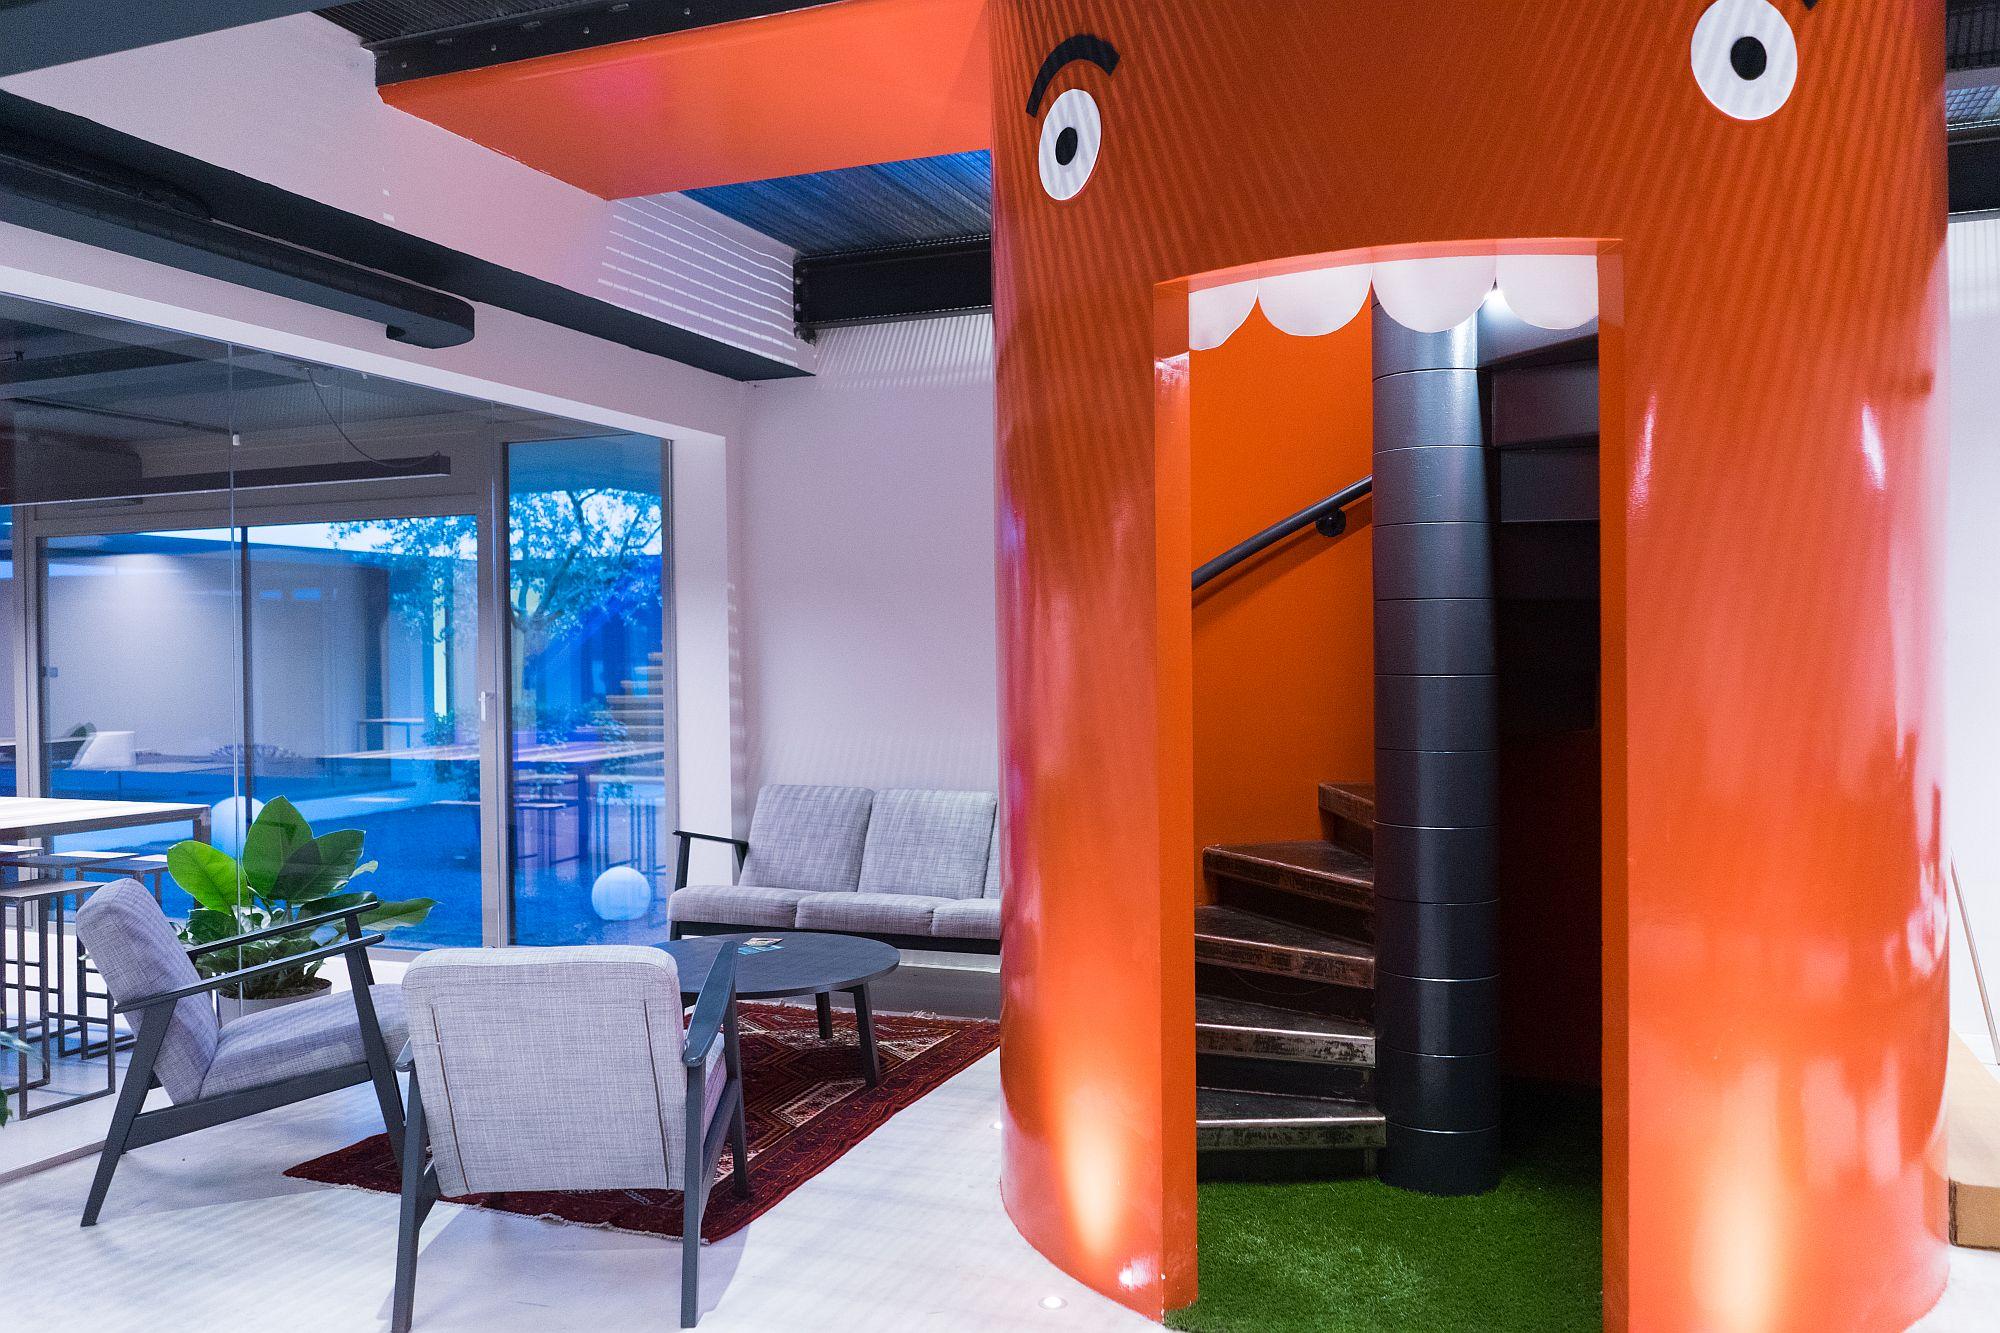 Pops of color and imaginative decor brighten the office